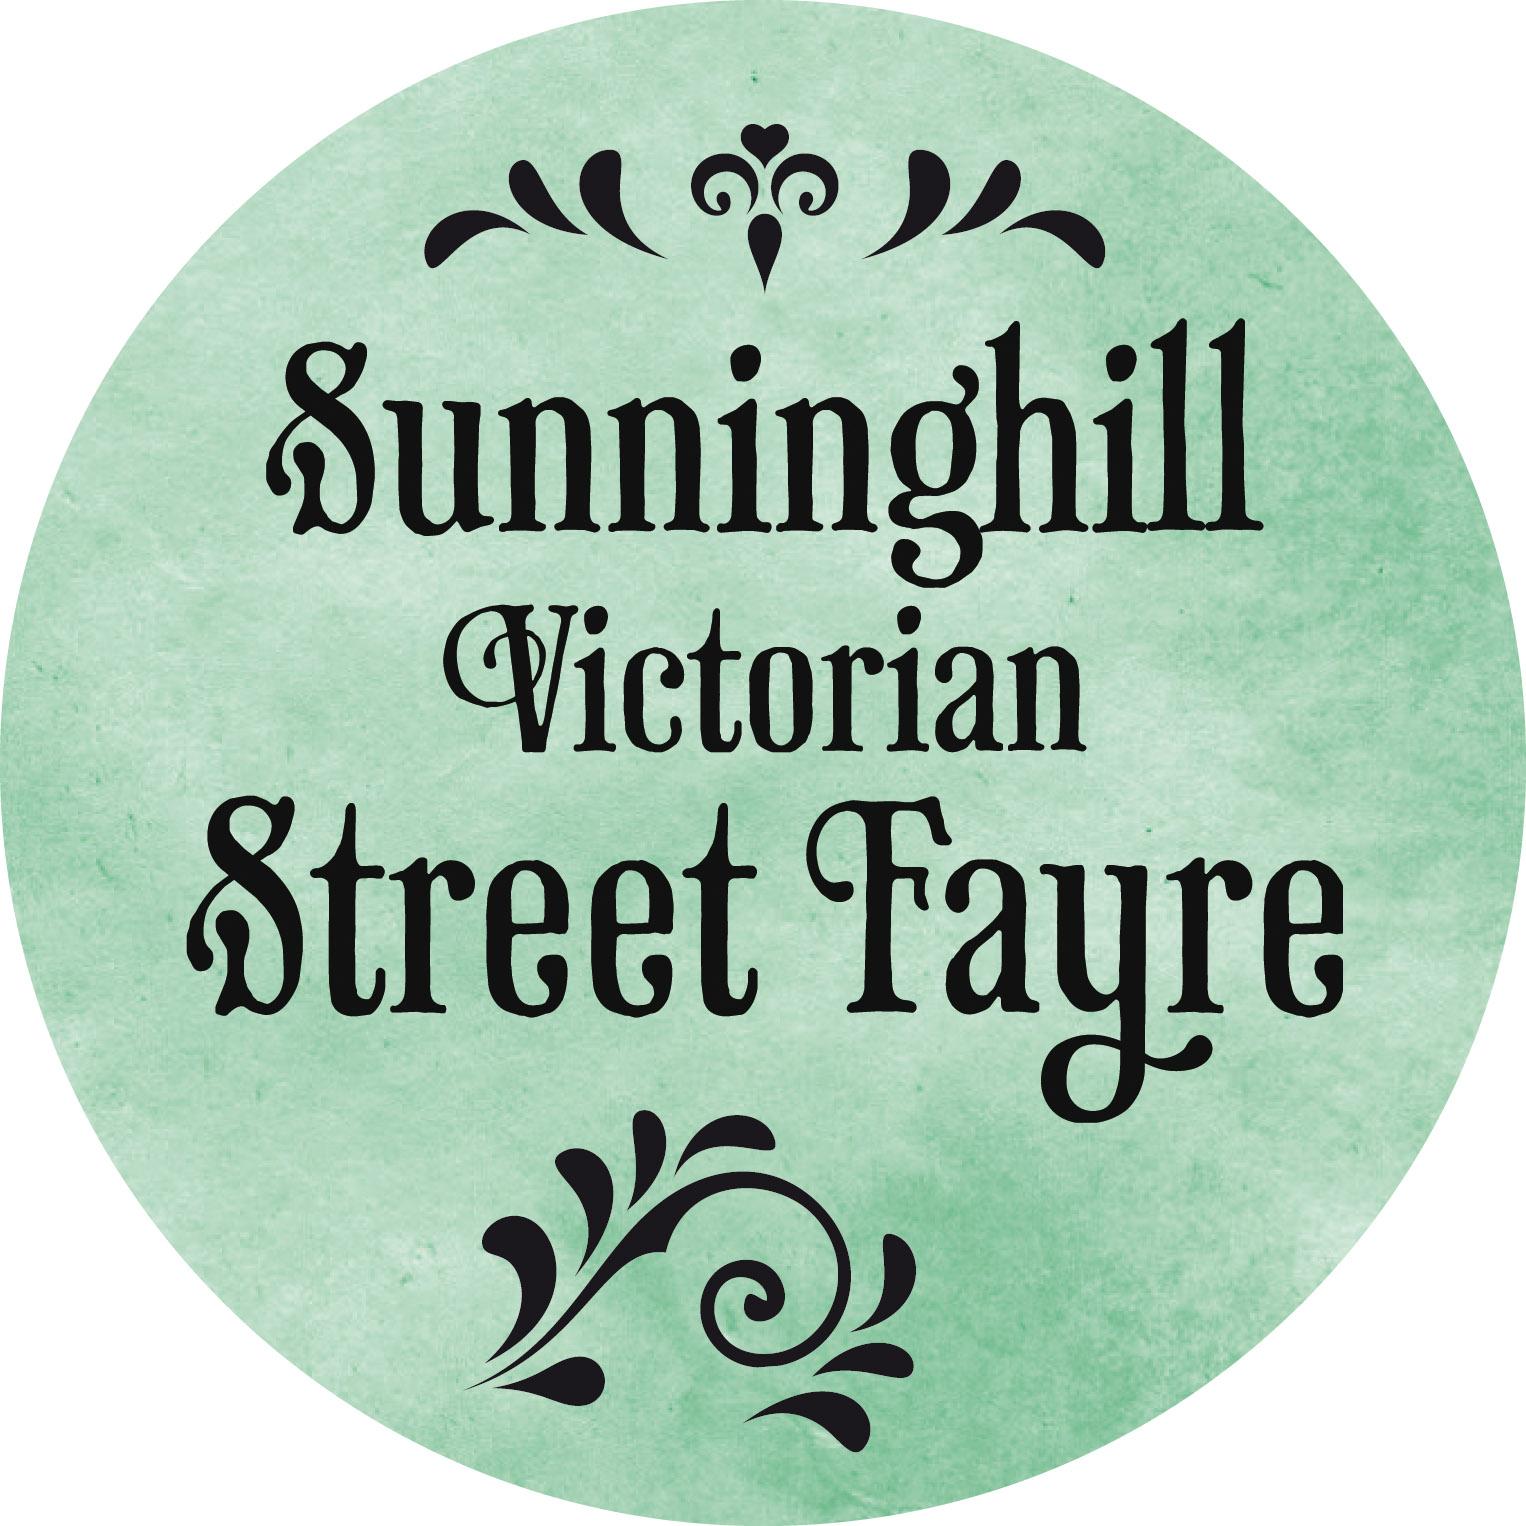 Victorian Street Fayre – Update